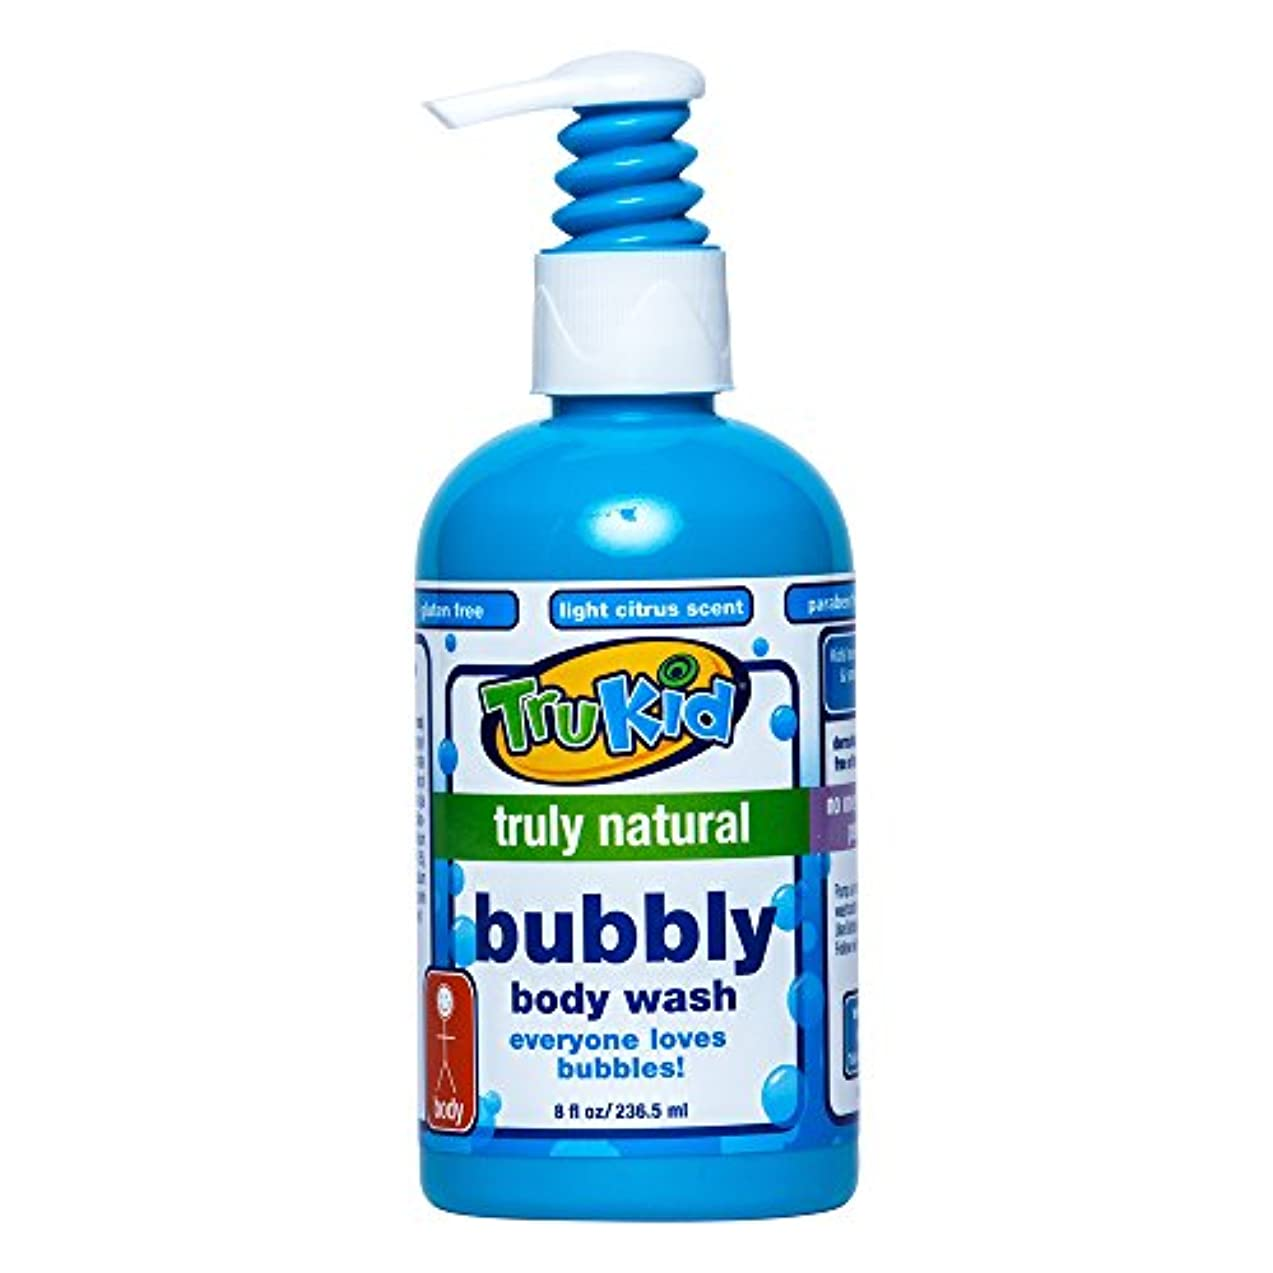 TruKid, Bubbly Body Wash, 8 fl oz (236.5 ml)